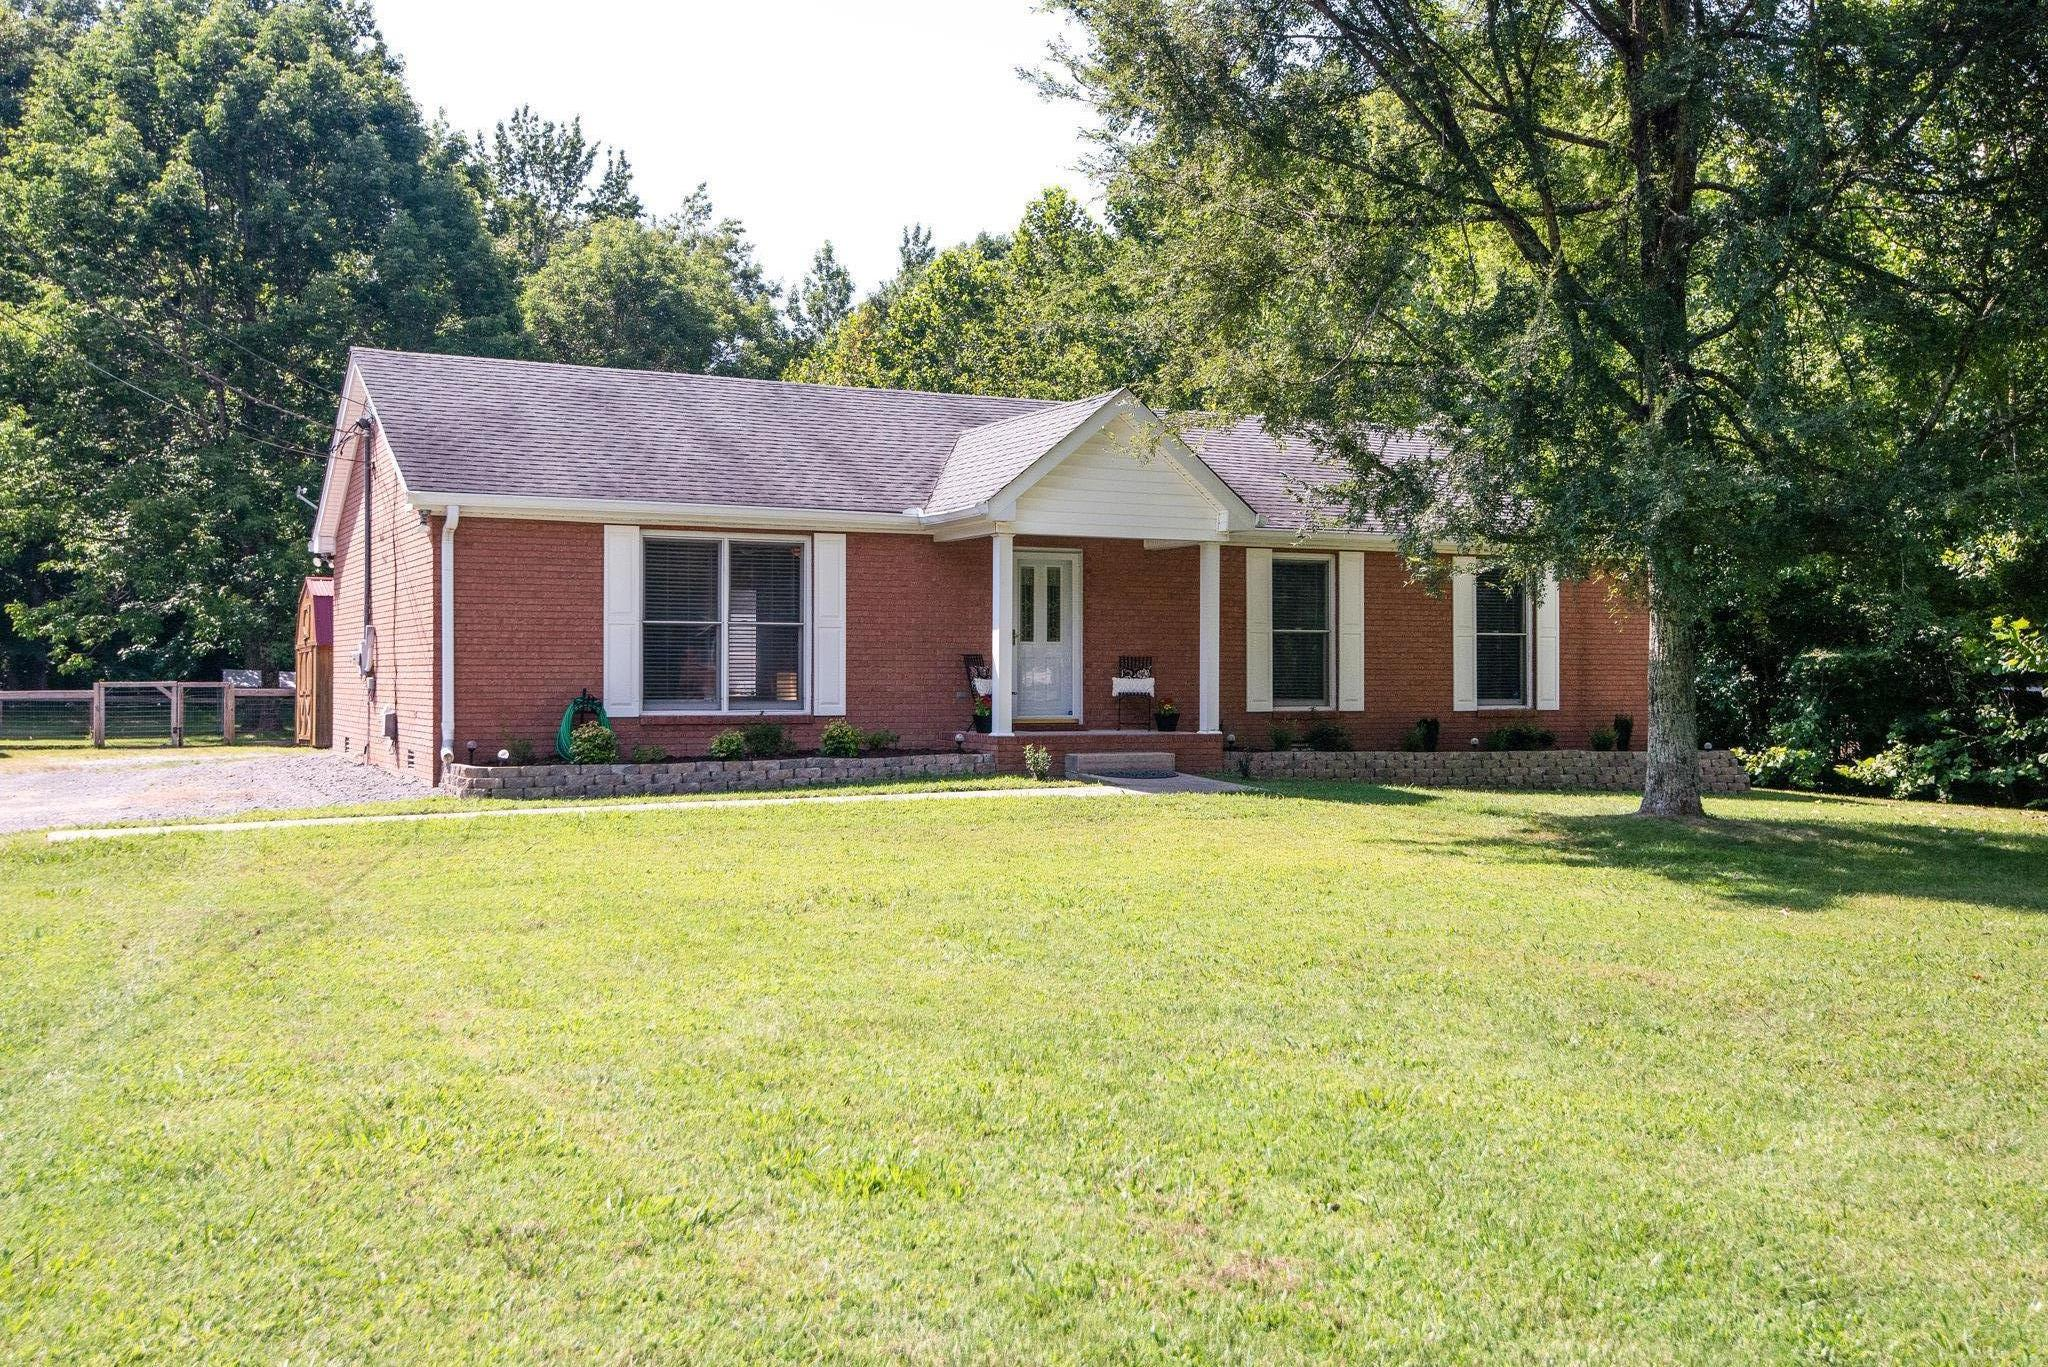 3113 Milliken Dr, Joelton, TN 37080 - Joelton, TN real estate listing